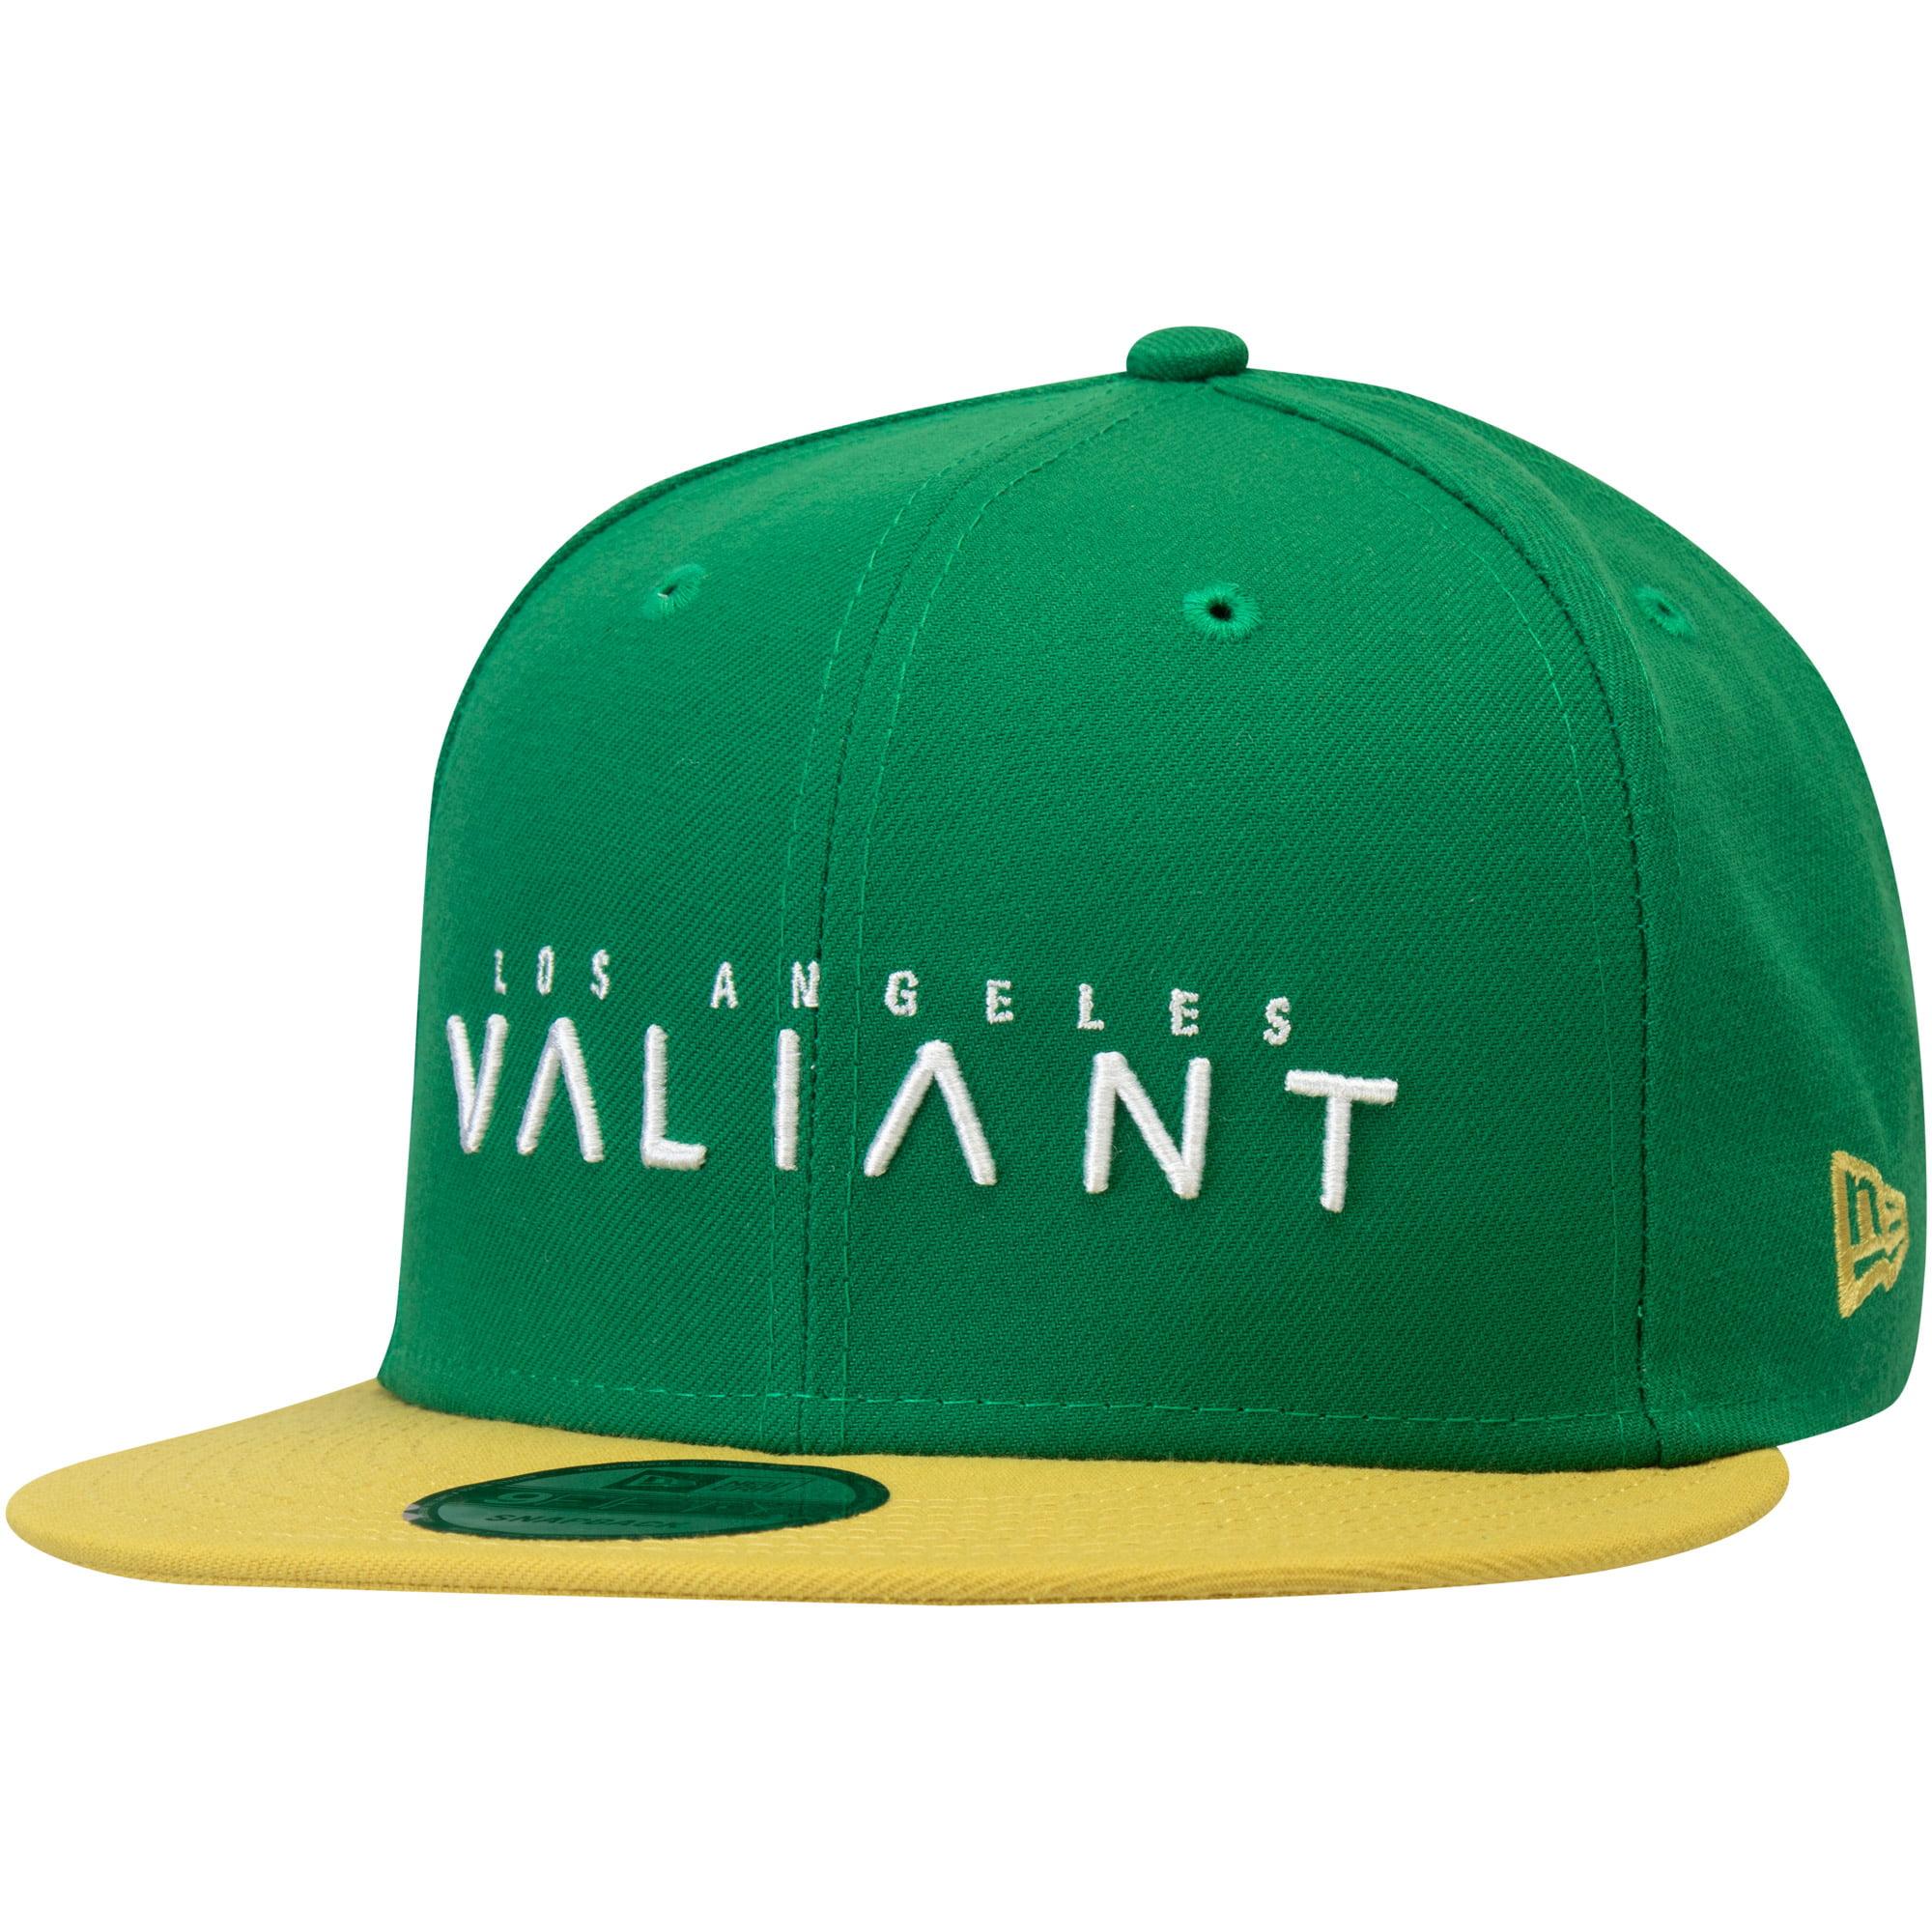 Los Angeles Valiant Overwatch League New Era Two-Tone Team Snapback Adjustable Hat - Green - OSFA